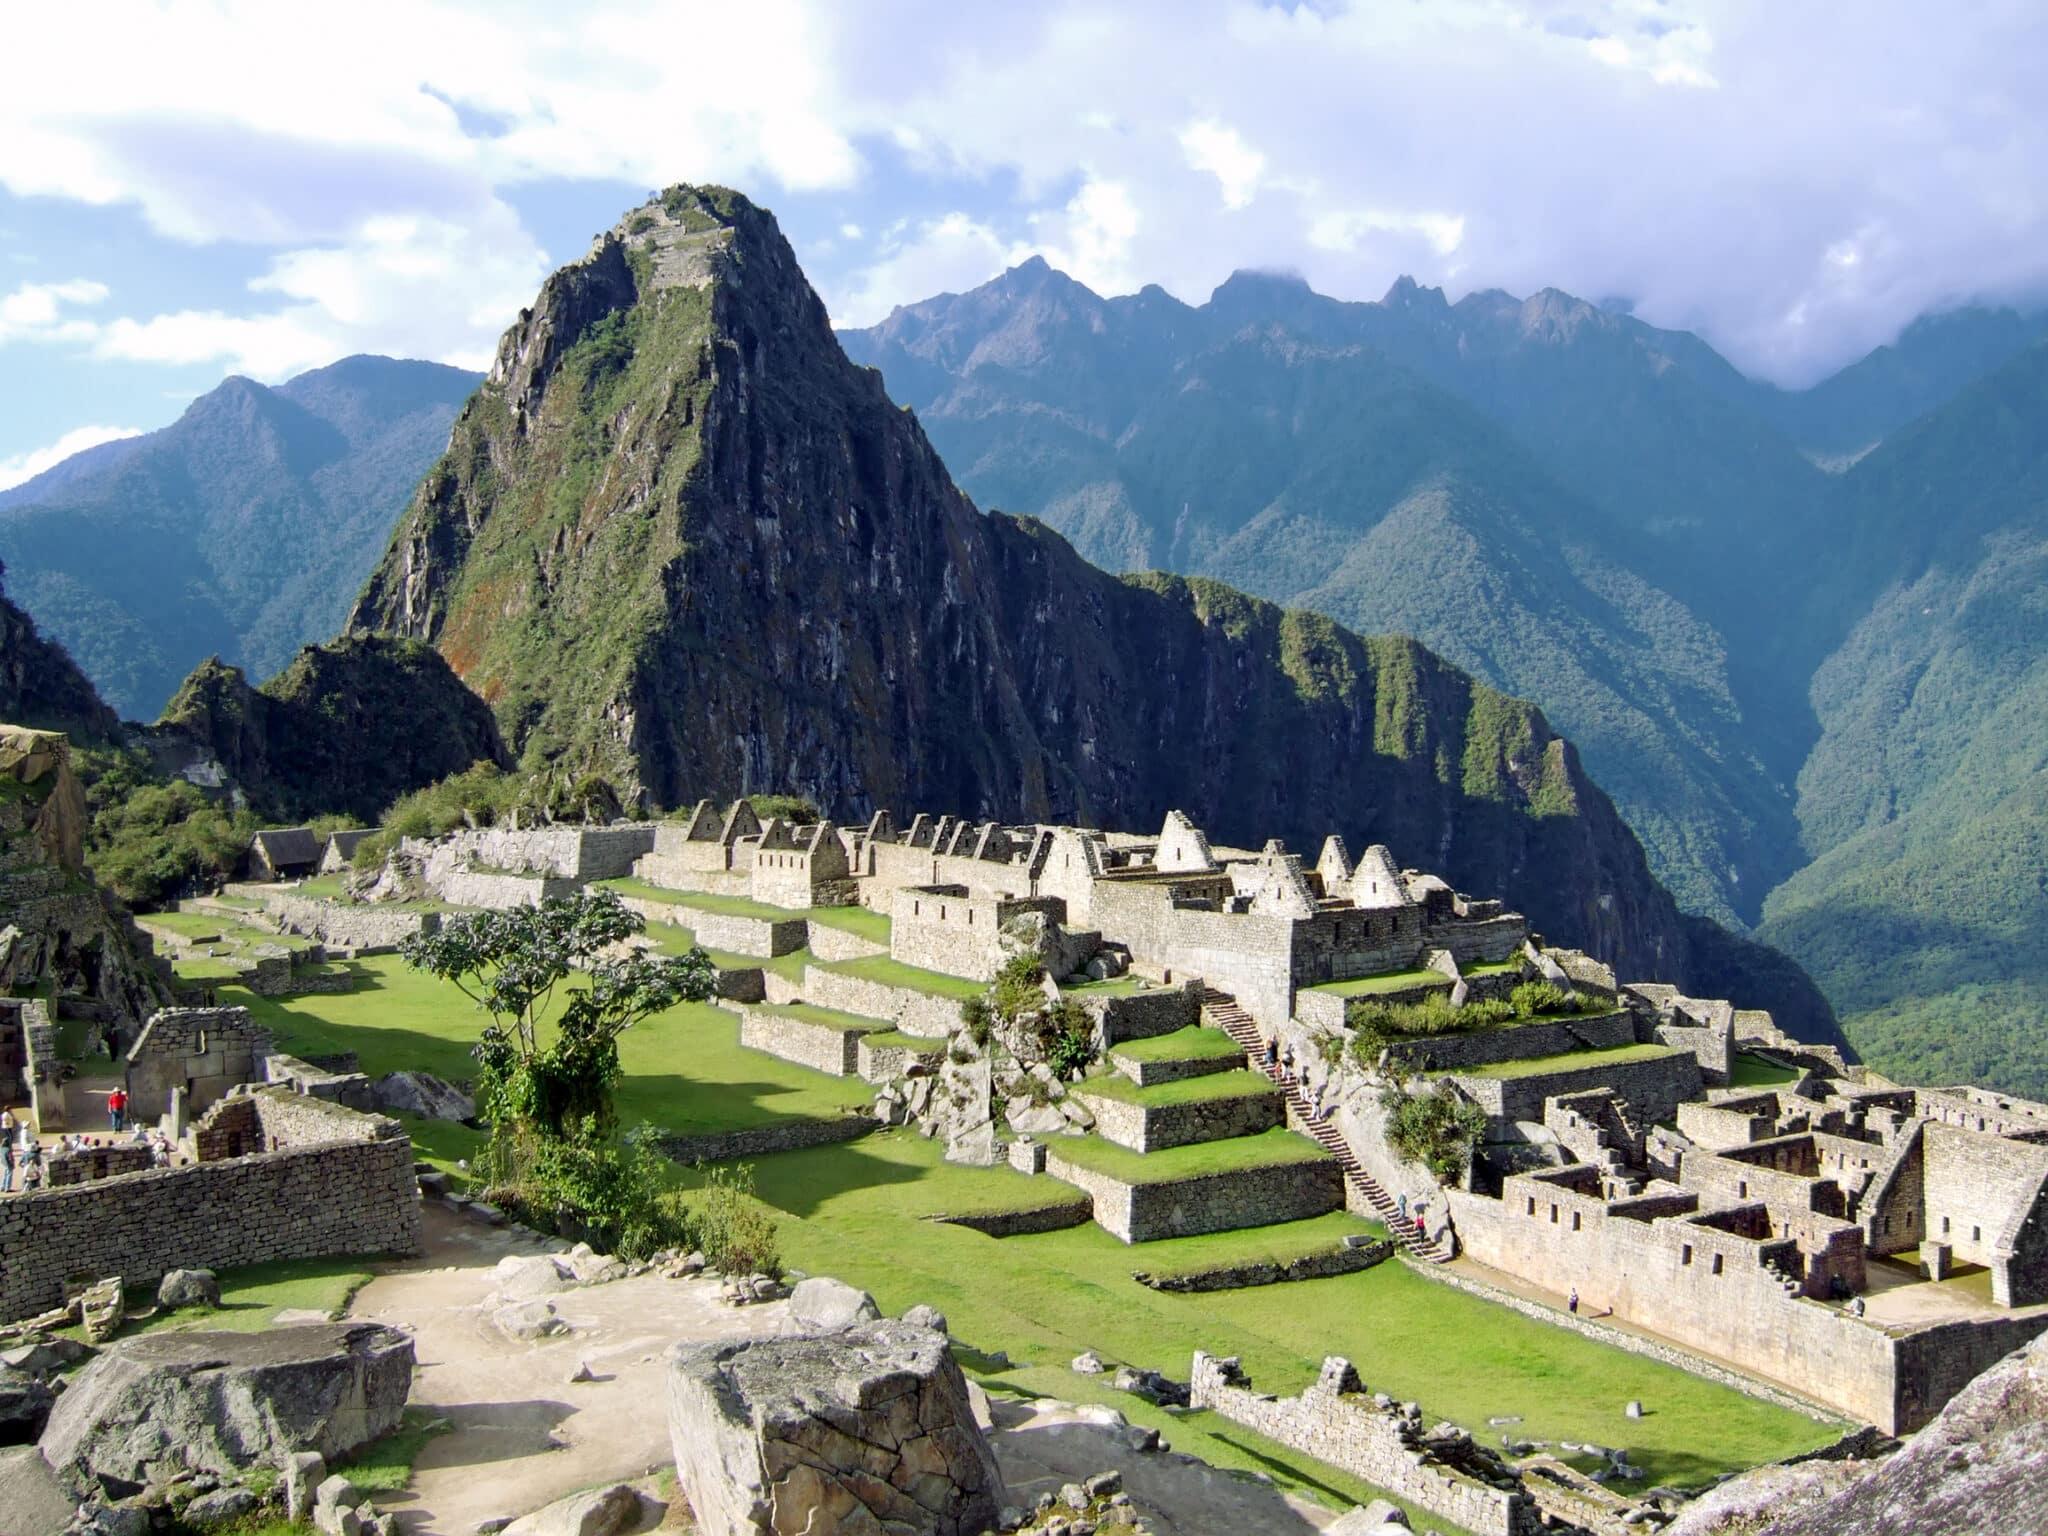 View of the Lost Incan City of Machu Picchu near Cusco Peru. provided by Resprt Weeks Club